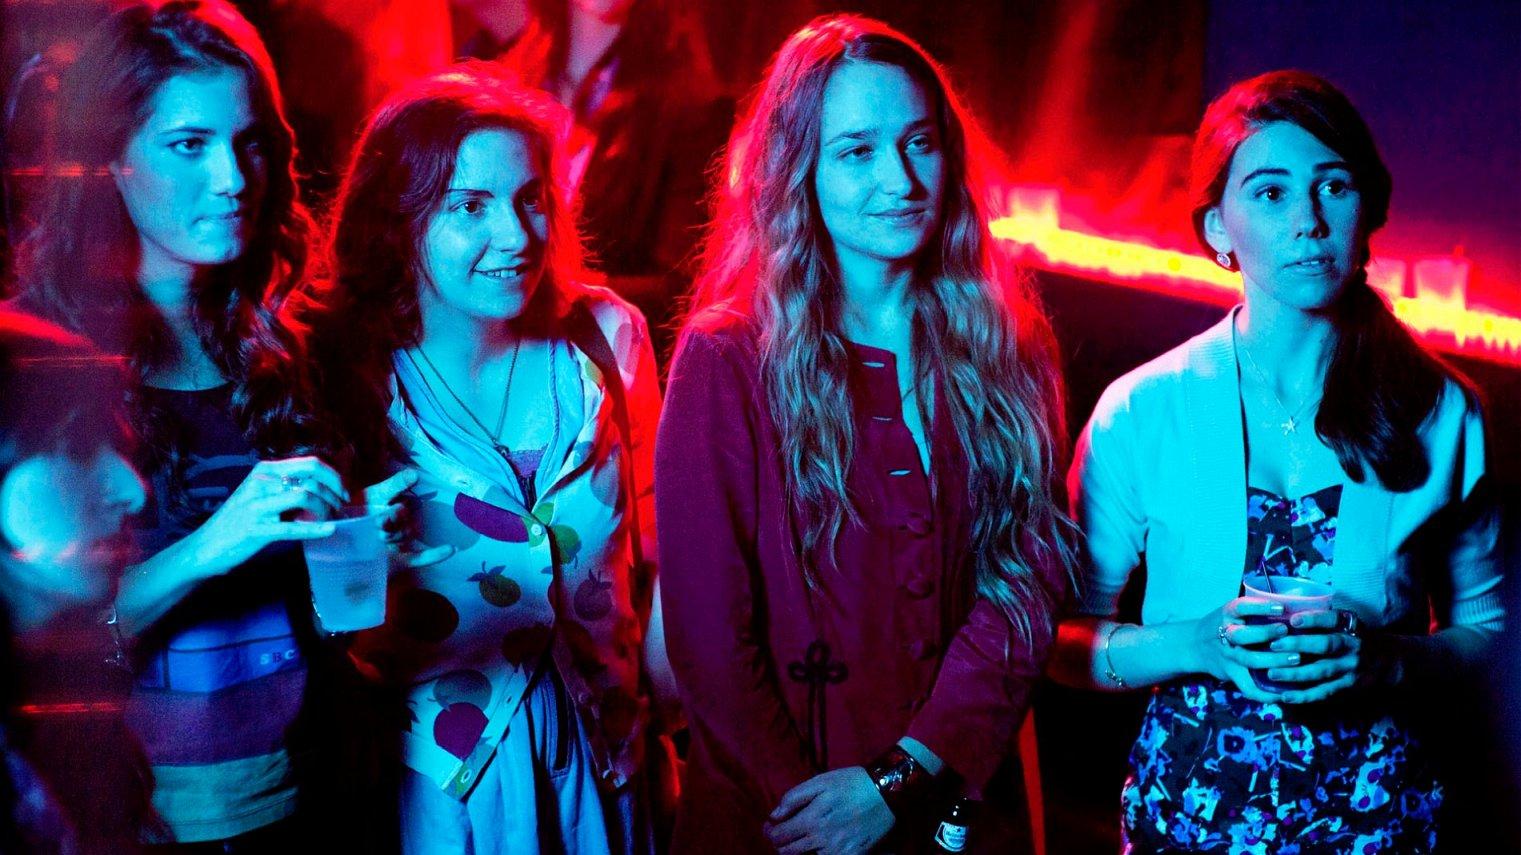 cast of Girls season 6